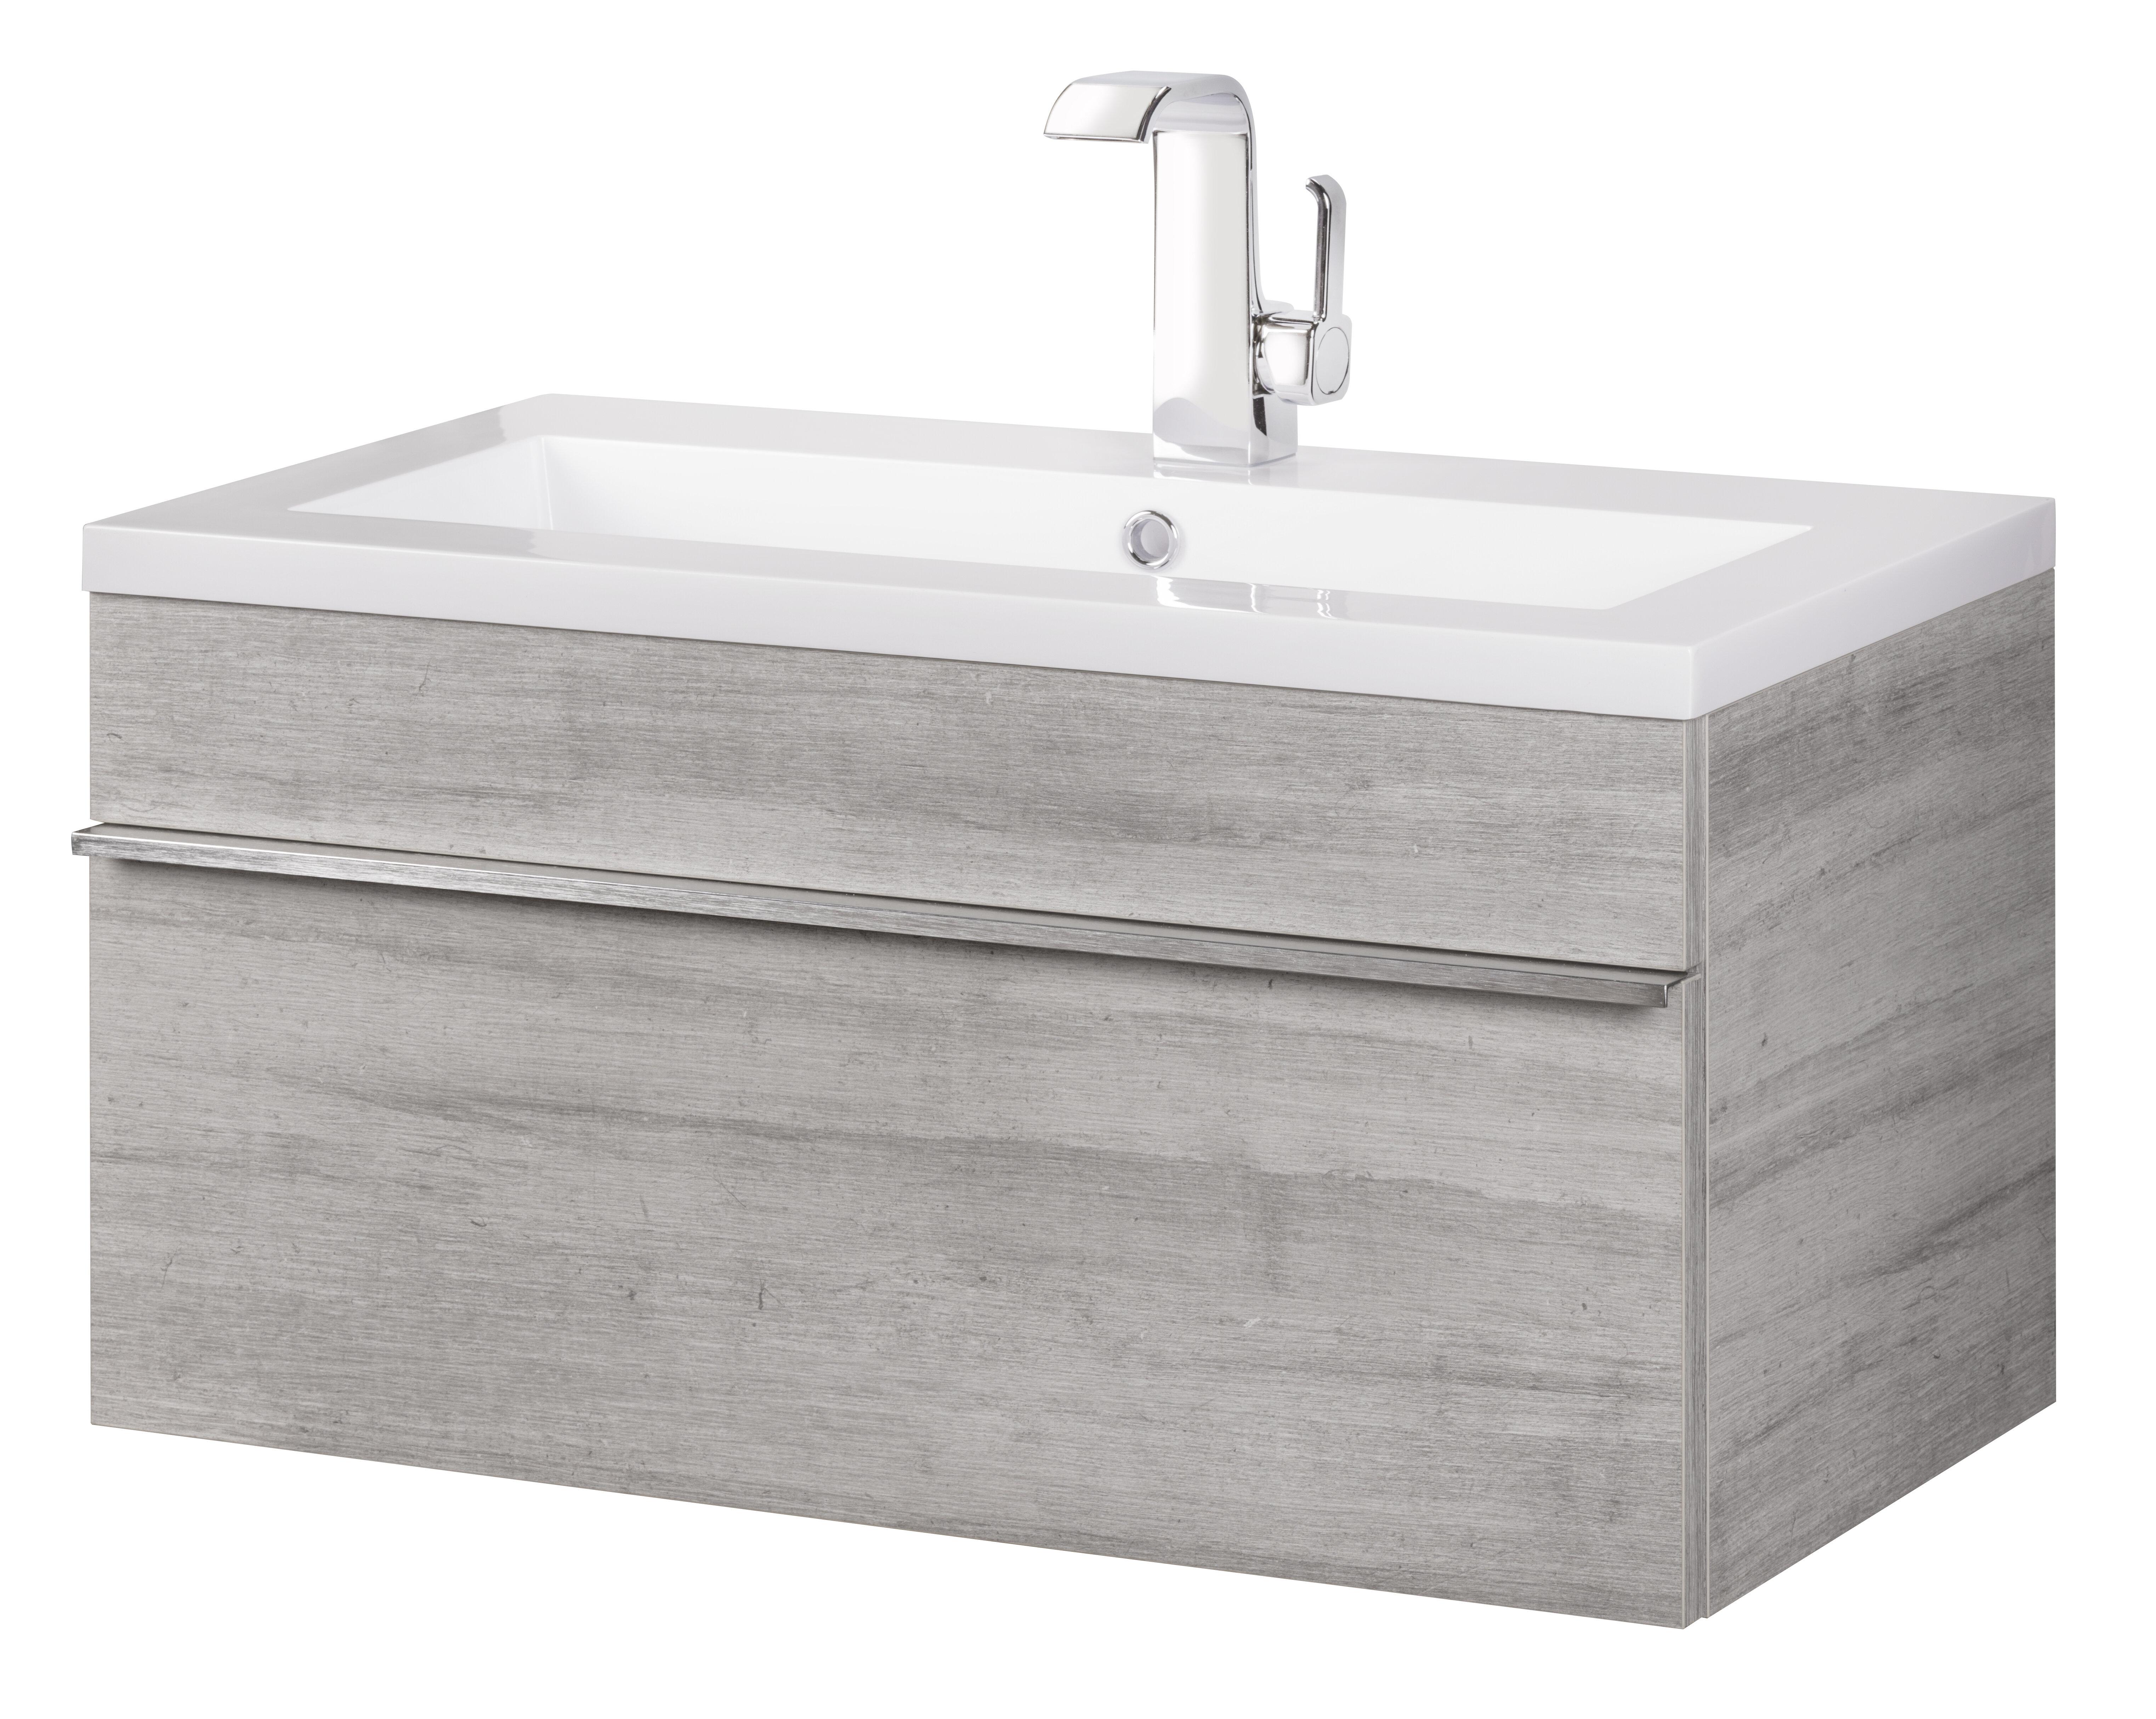 Ivy Bronx Hewlett 30 Wall Mounted Single Bathroom Vanity Set Reviews Wayfair